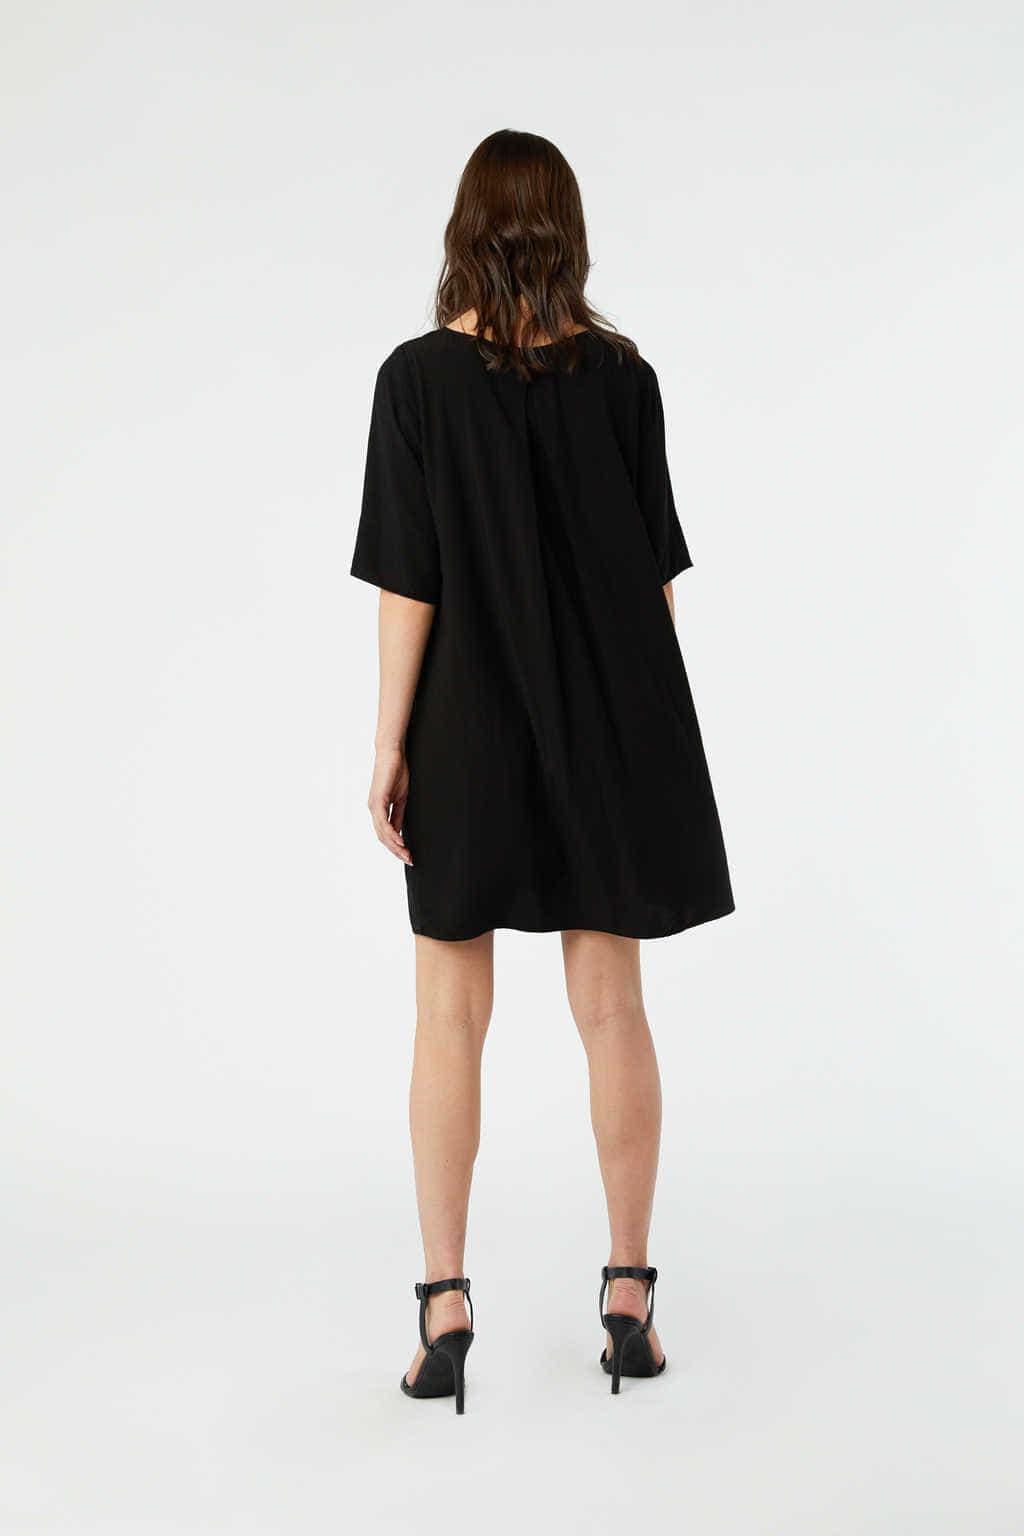 Dress 3052 Black 12